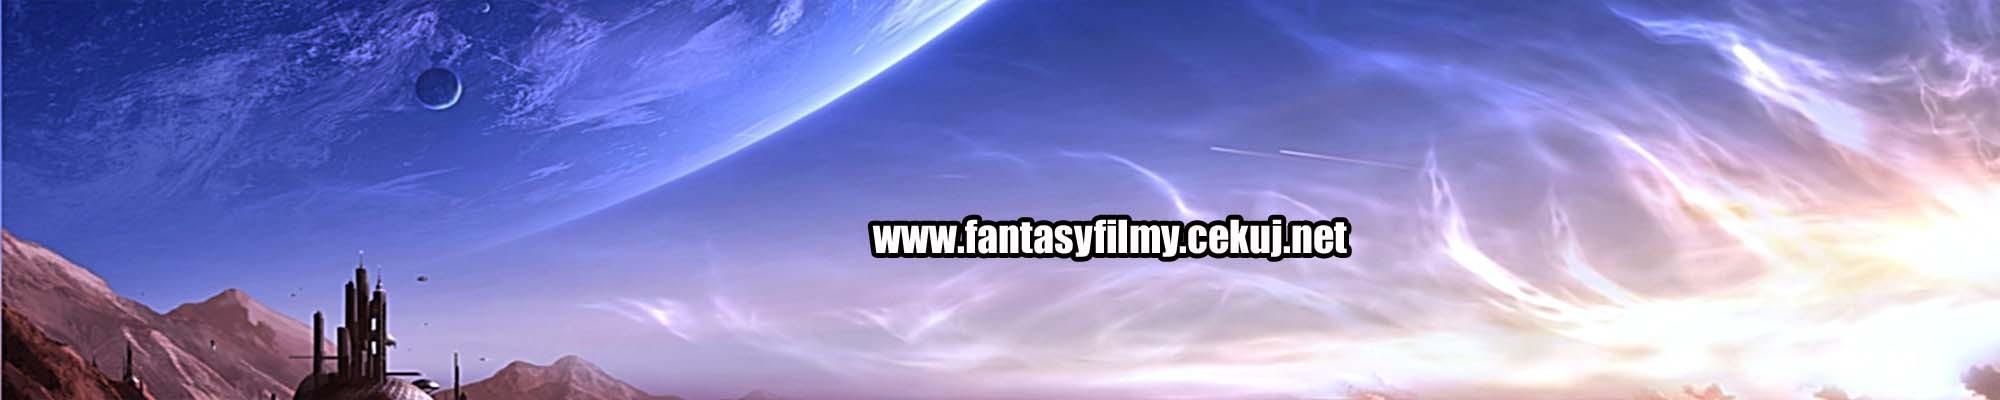 Fantasy filmy